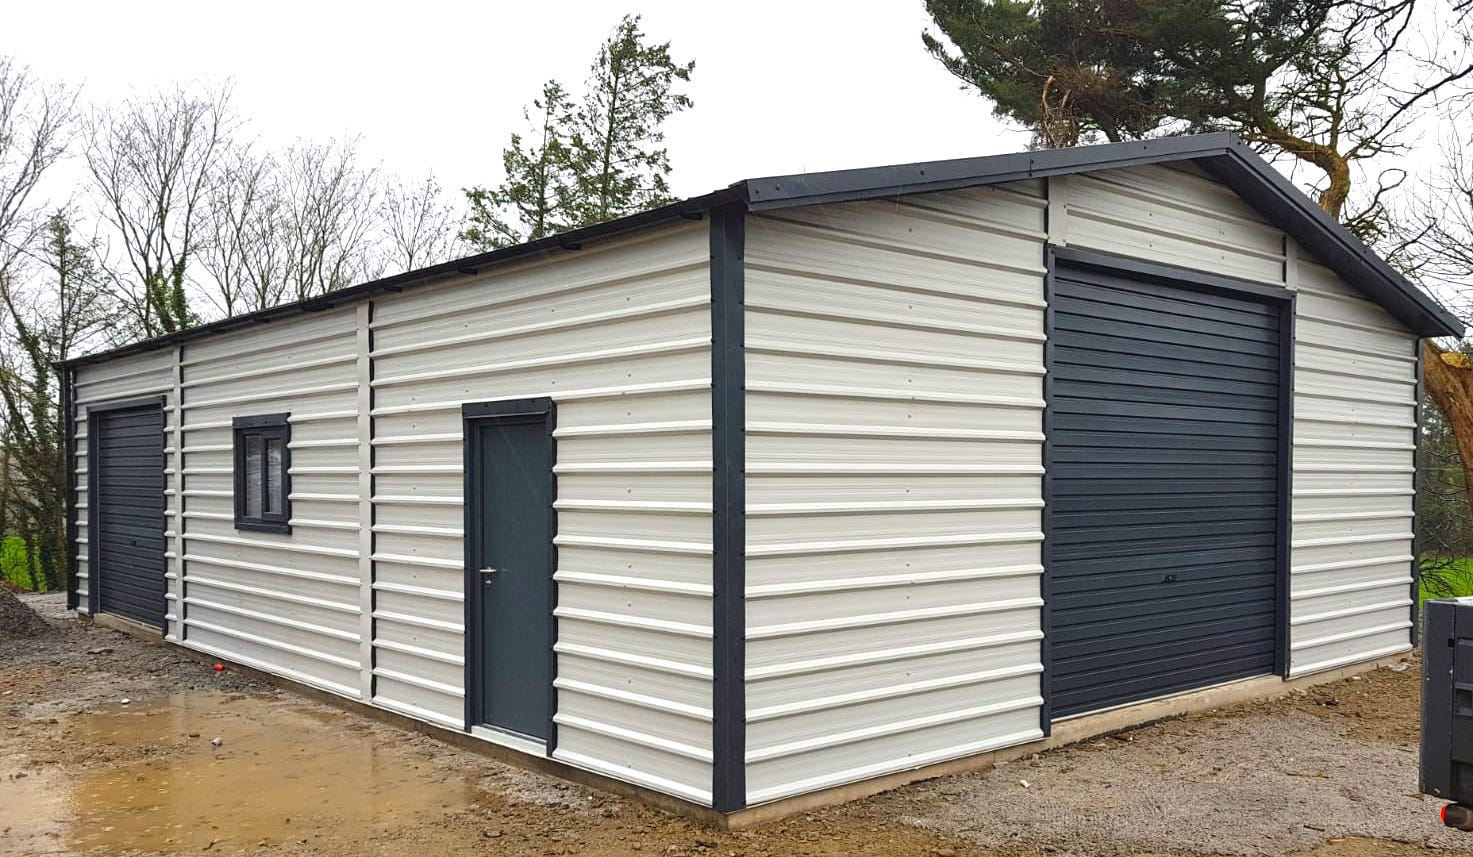 A1-Steel-Sheds-Garden-Shed-Cork-Garage-Home-Office.JPG